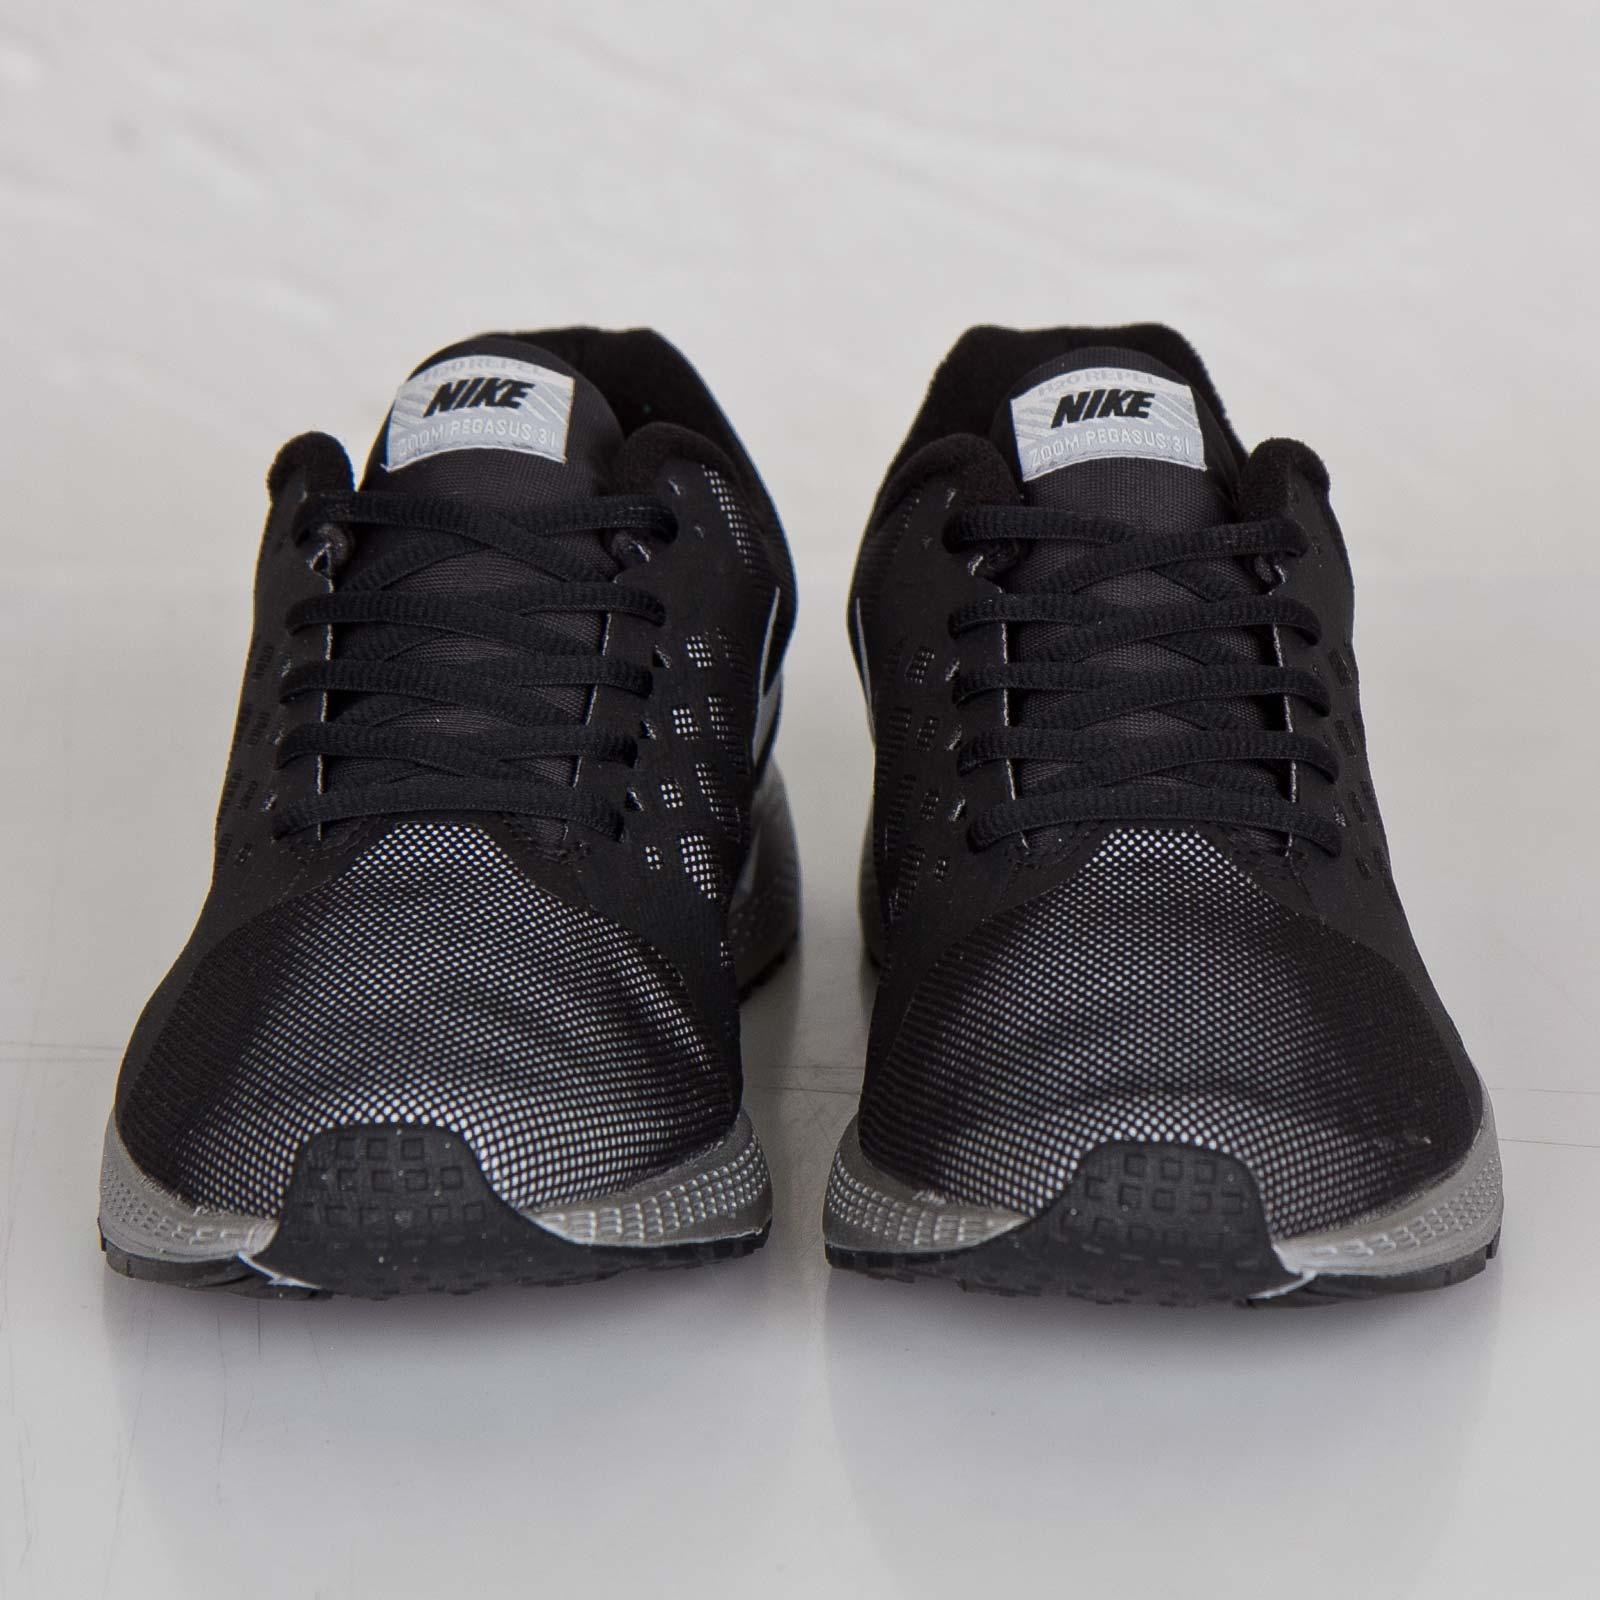 best cheap 17dc5 4abcf Nike Zoom Pegasus 31 Flash - 683676-001 - Sneakersnstuff   sneakers    streetwear online since 1999